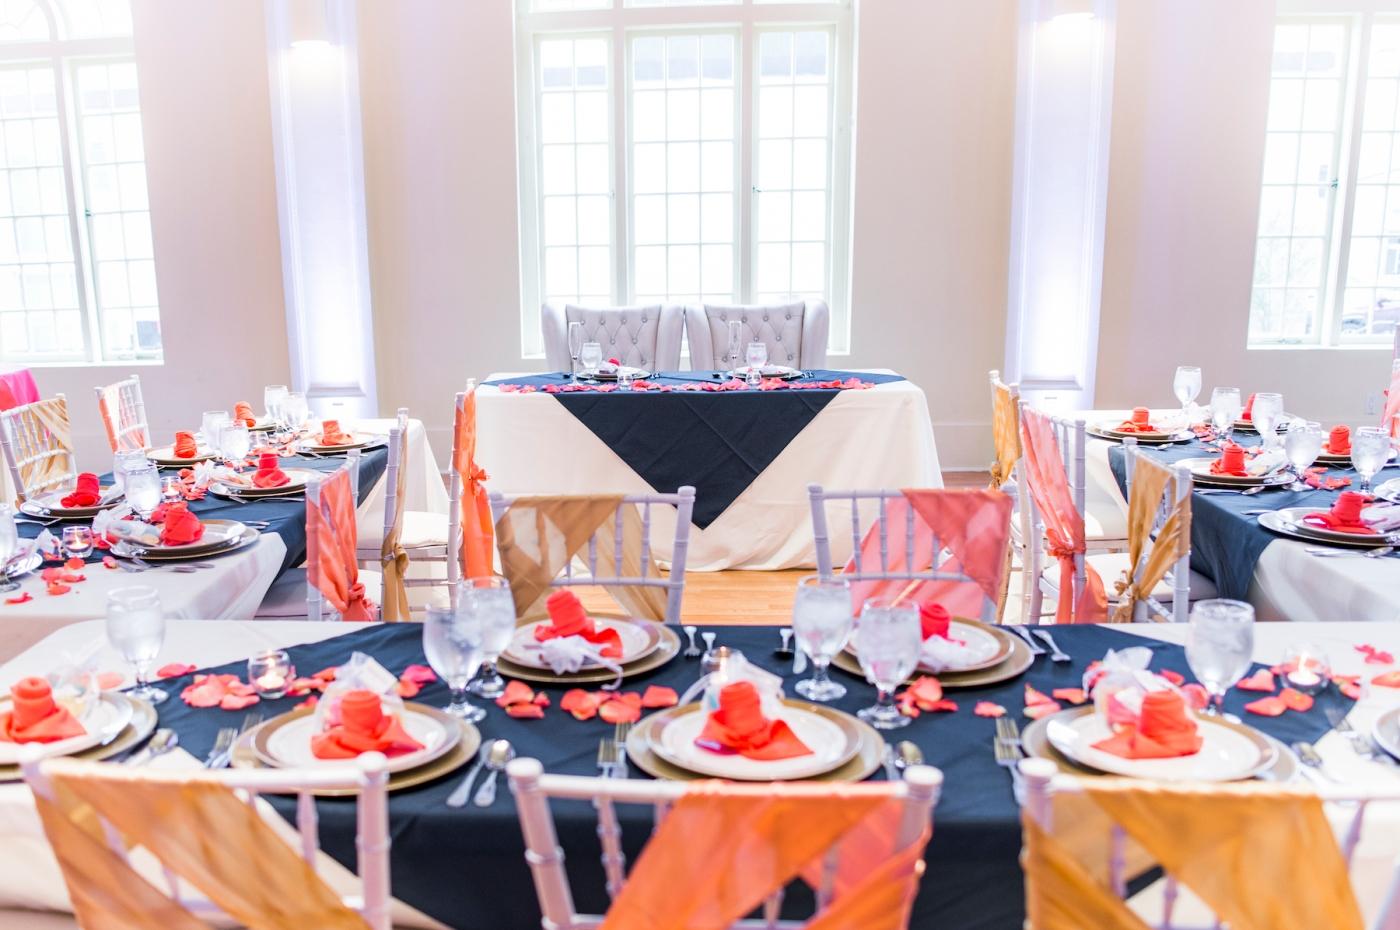 DSC_3074Everett_Wedding_Ballroom_Jane_Speleers_photography_Rachel_and_Edmund_cake cutting_2017